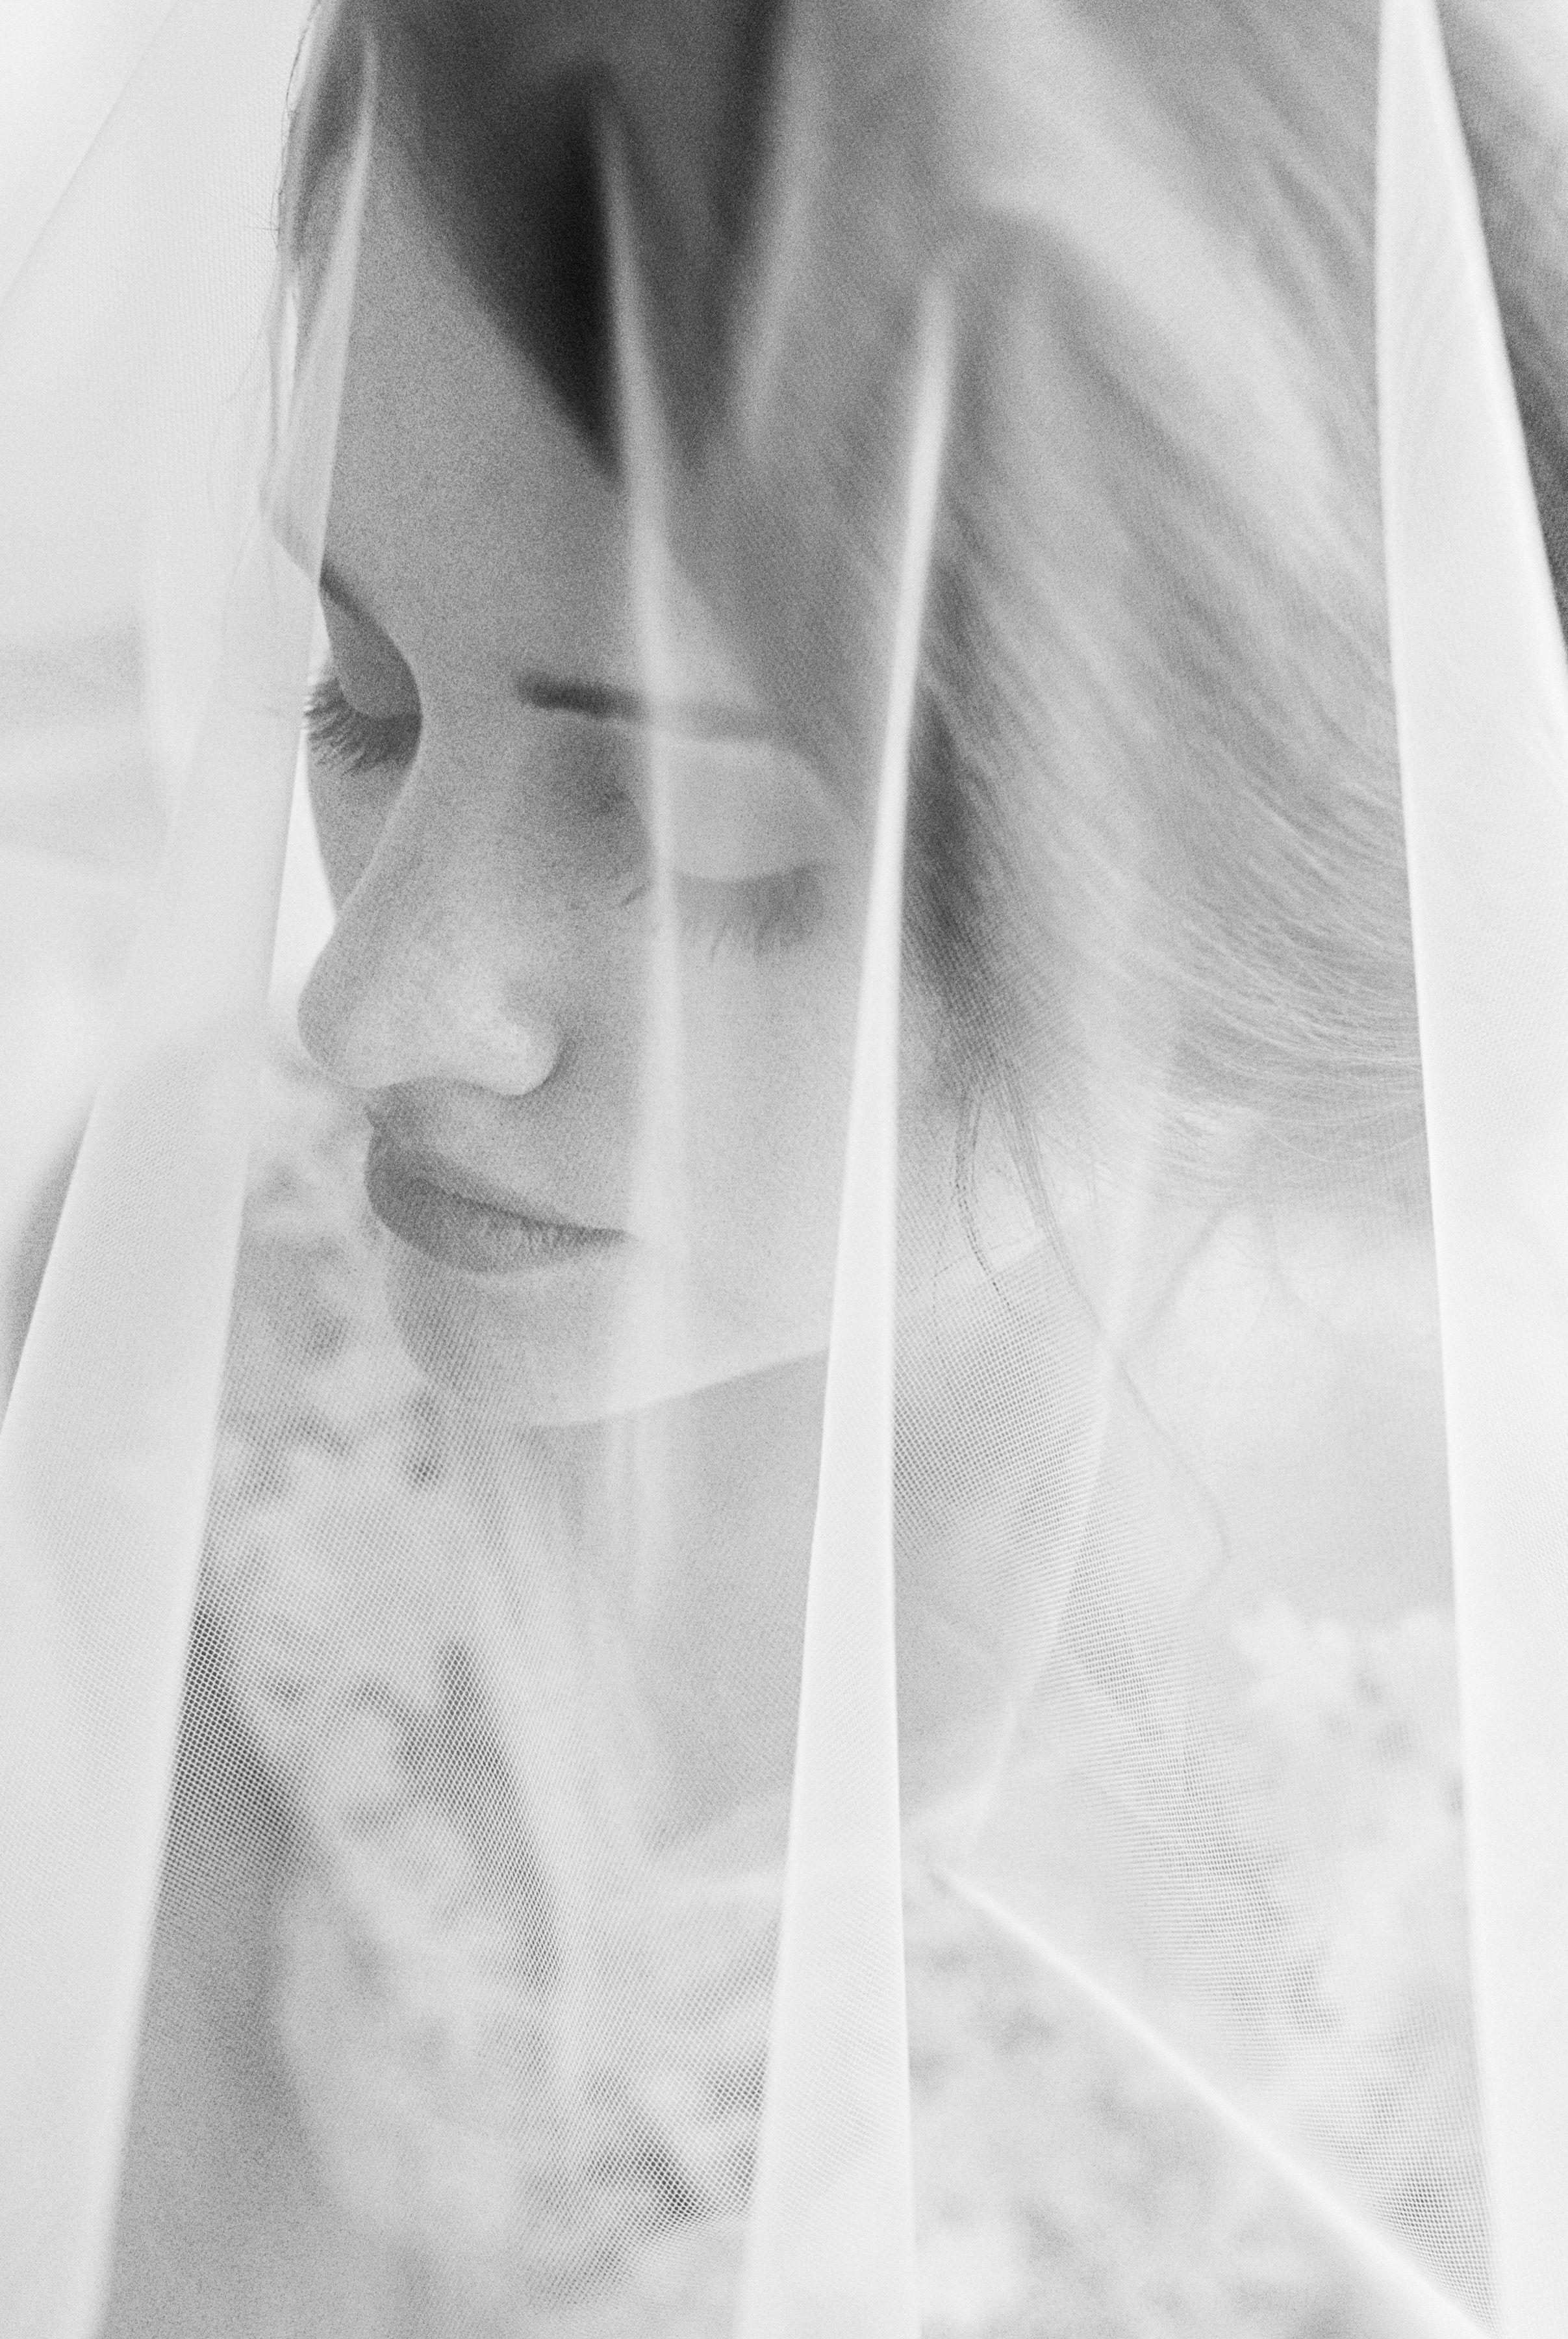 McKennaRachellePhotography_LightroomPDX (22).jpg